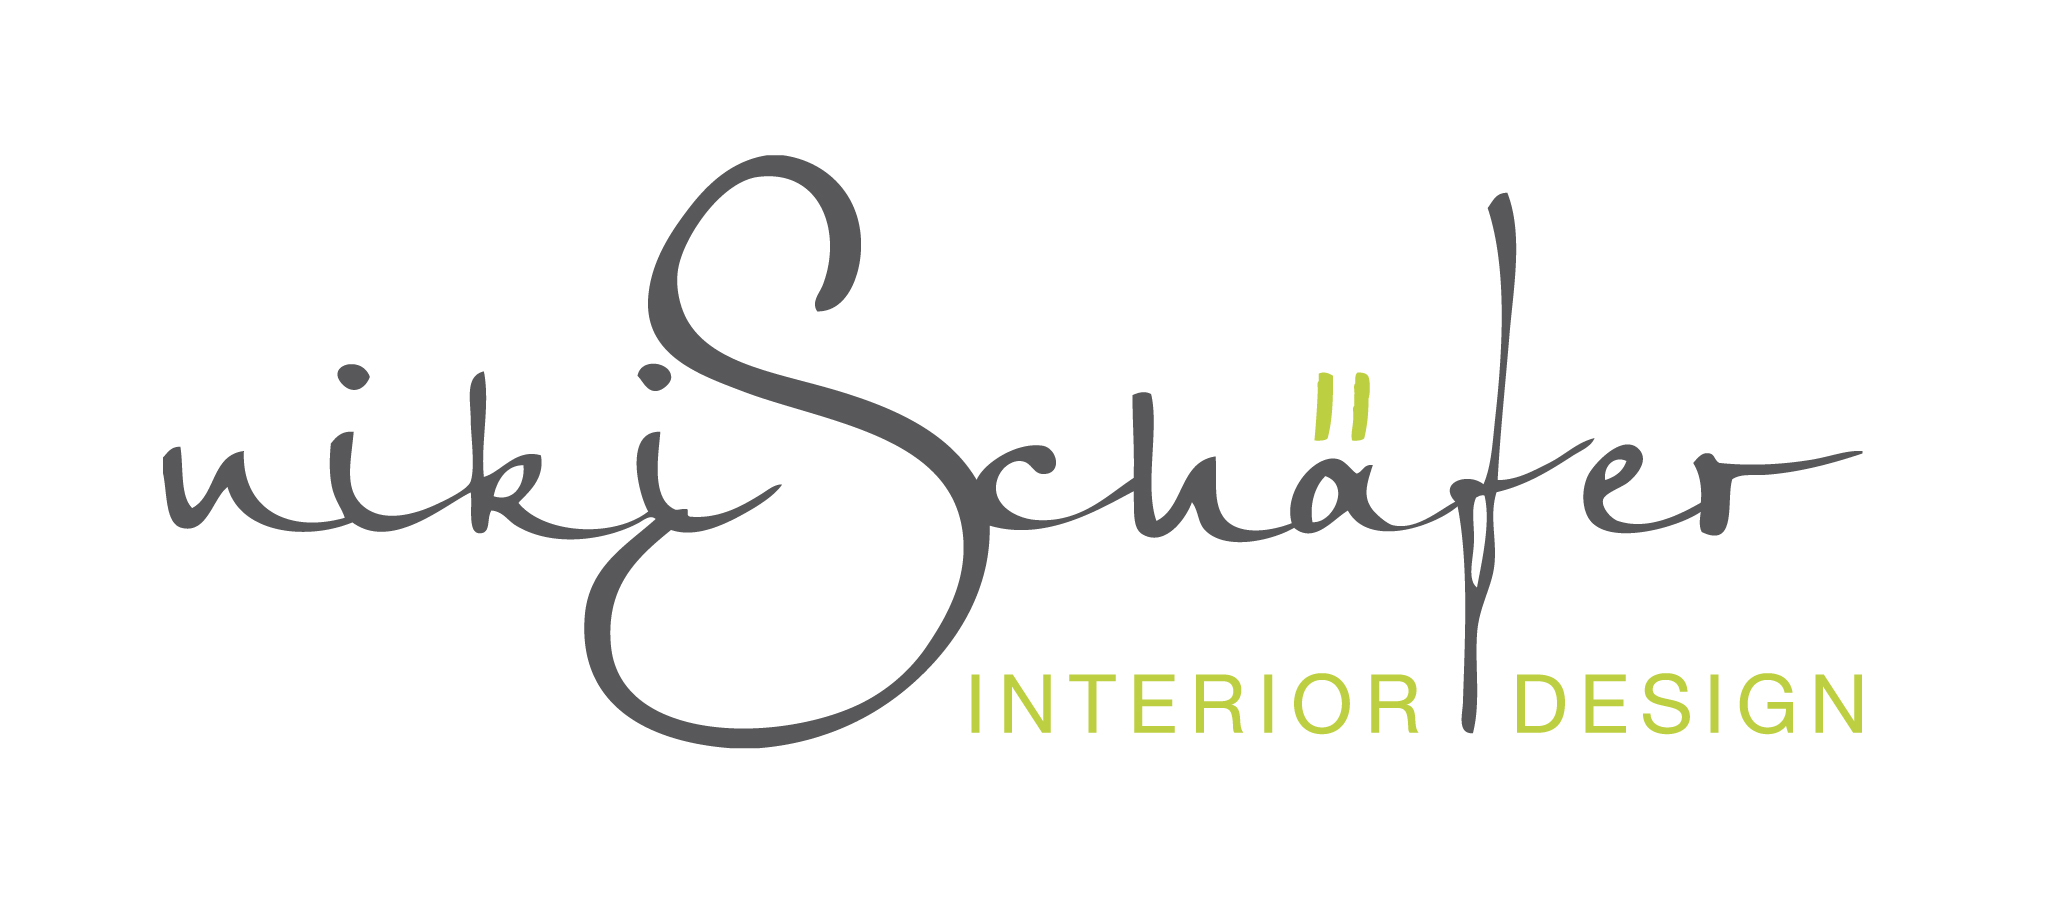 niki schafer interior design logo